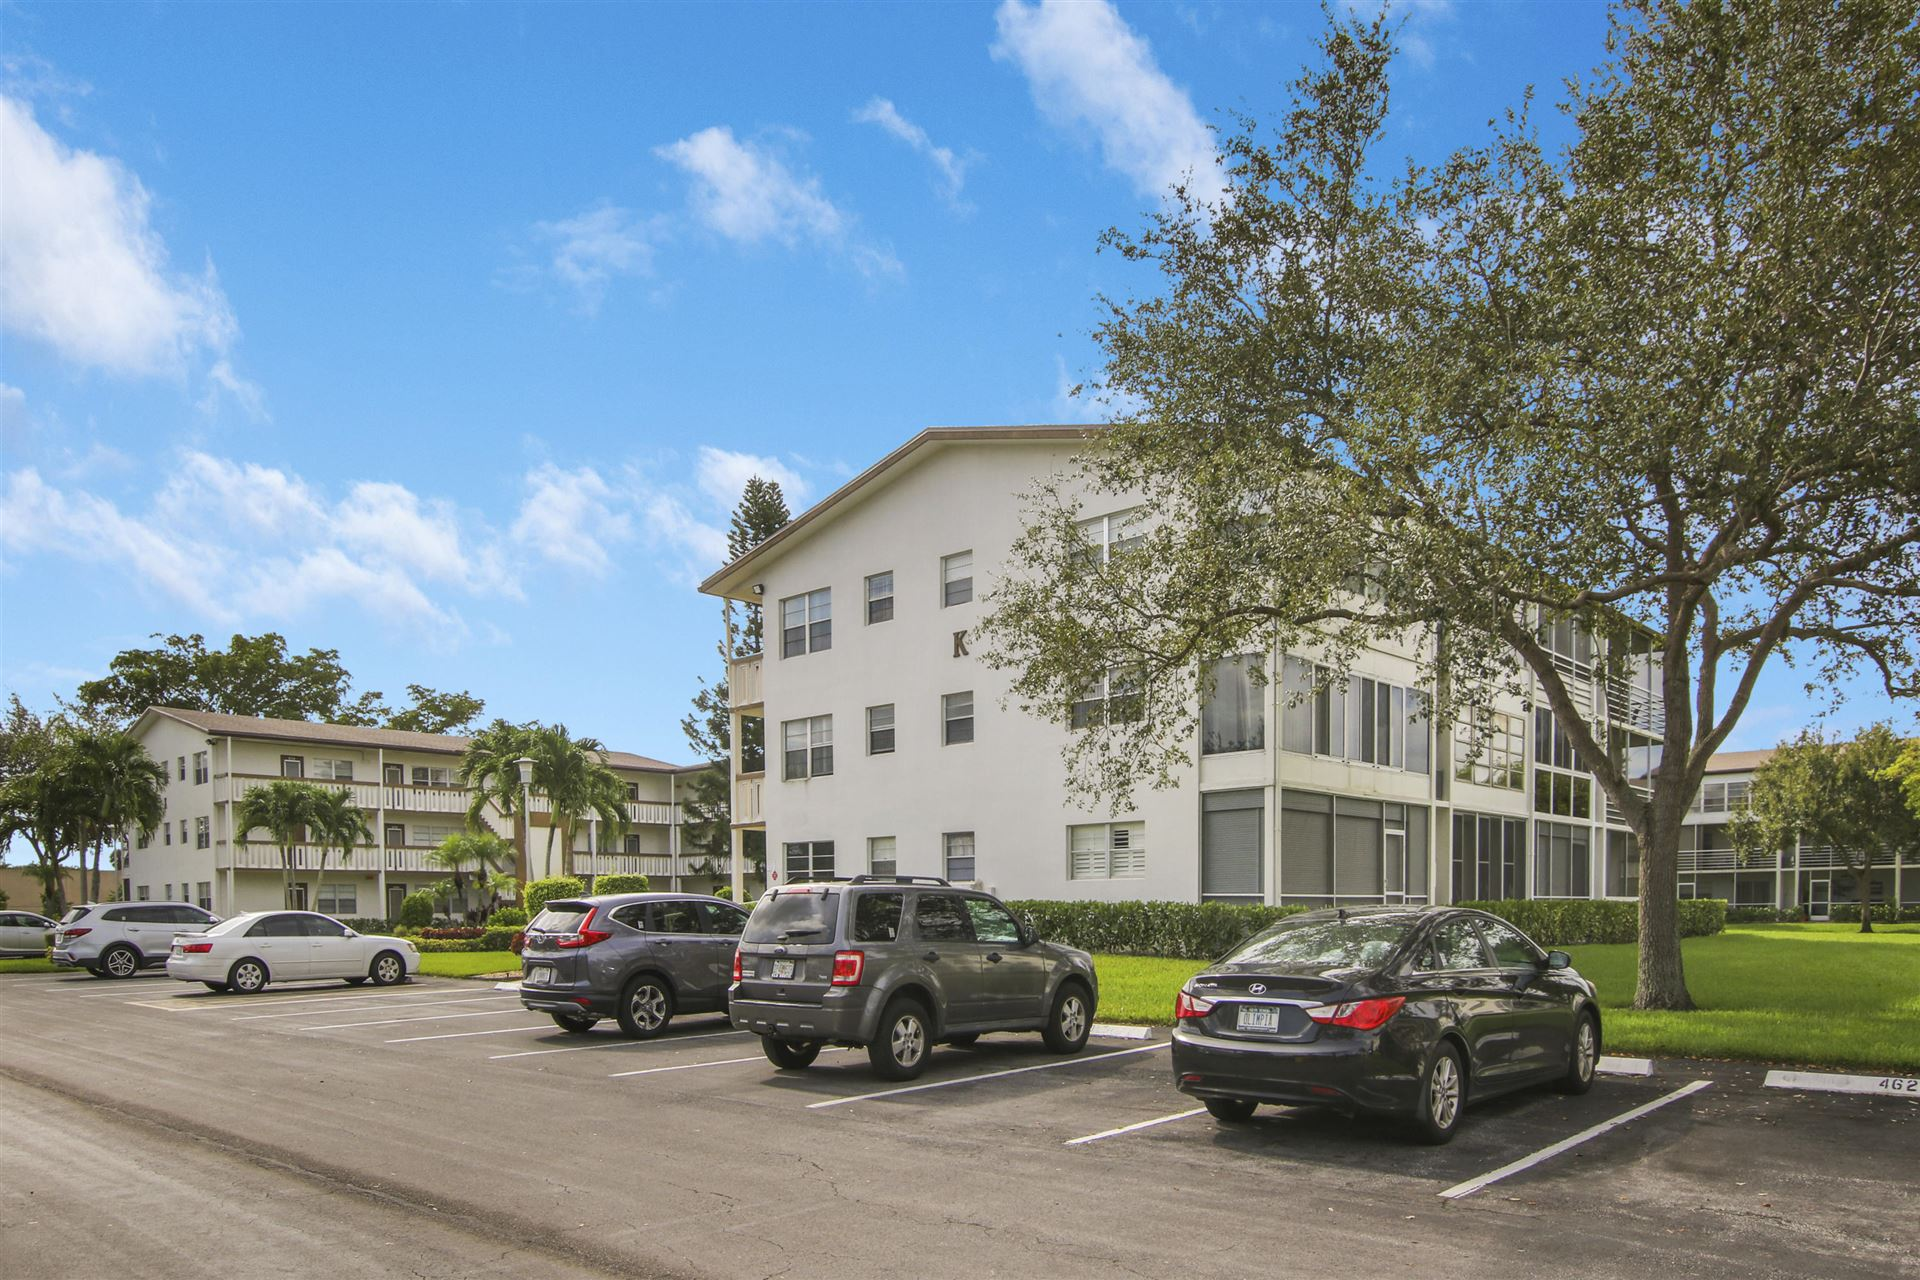 445 Mansfield K #445, Boca Raton, FL 33434 - #: RX-10648497